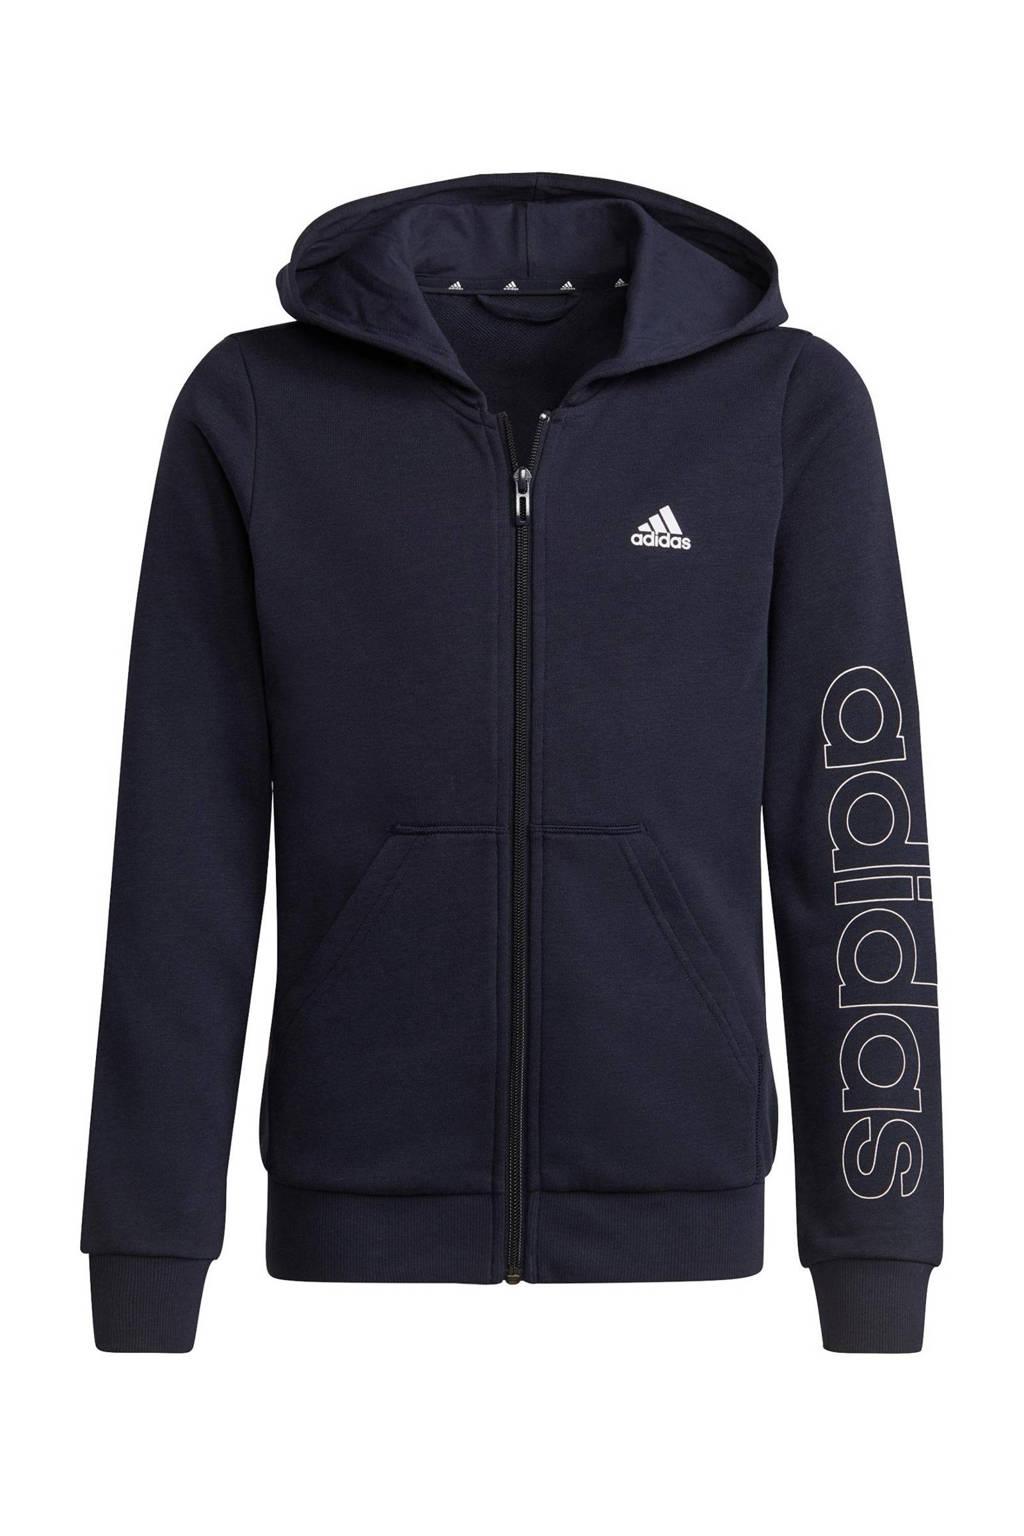 adidas Performance sportvest donkerblauw/wit, Donkerblauw/wit